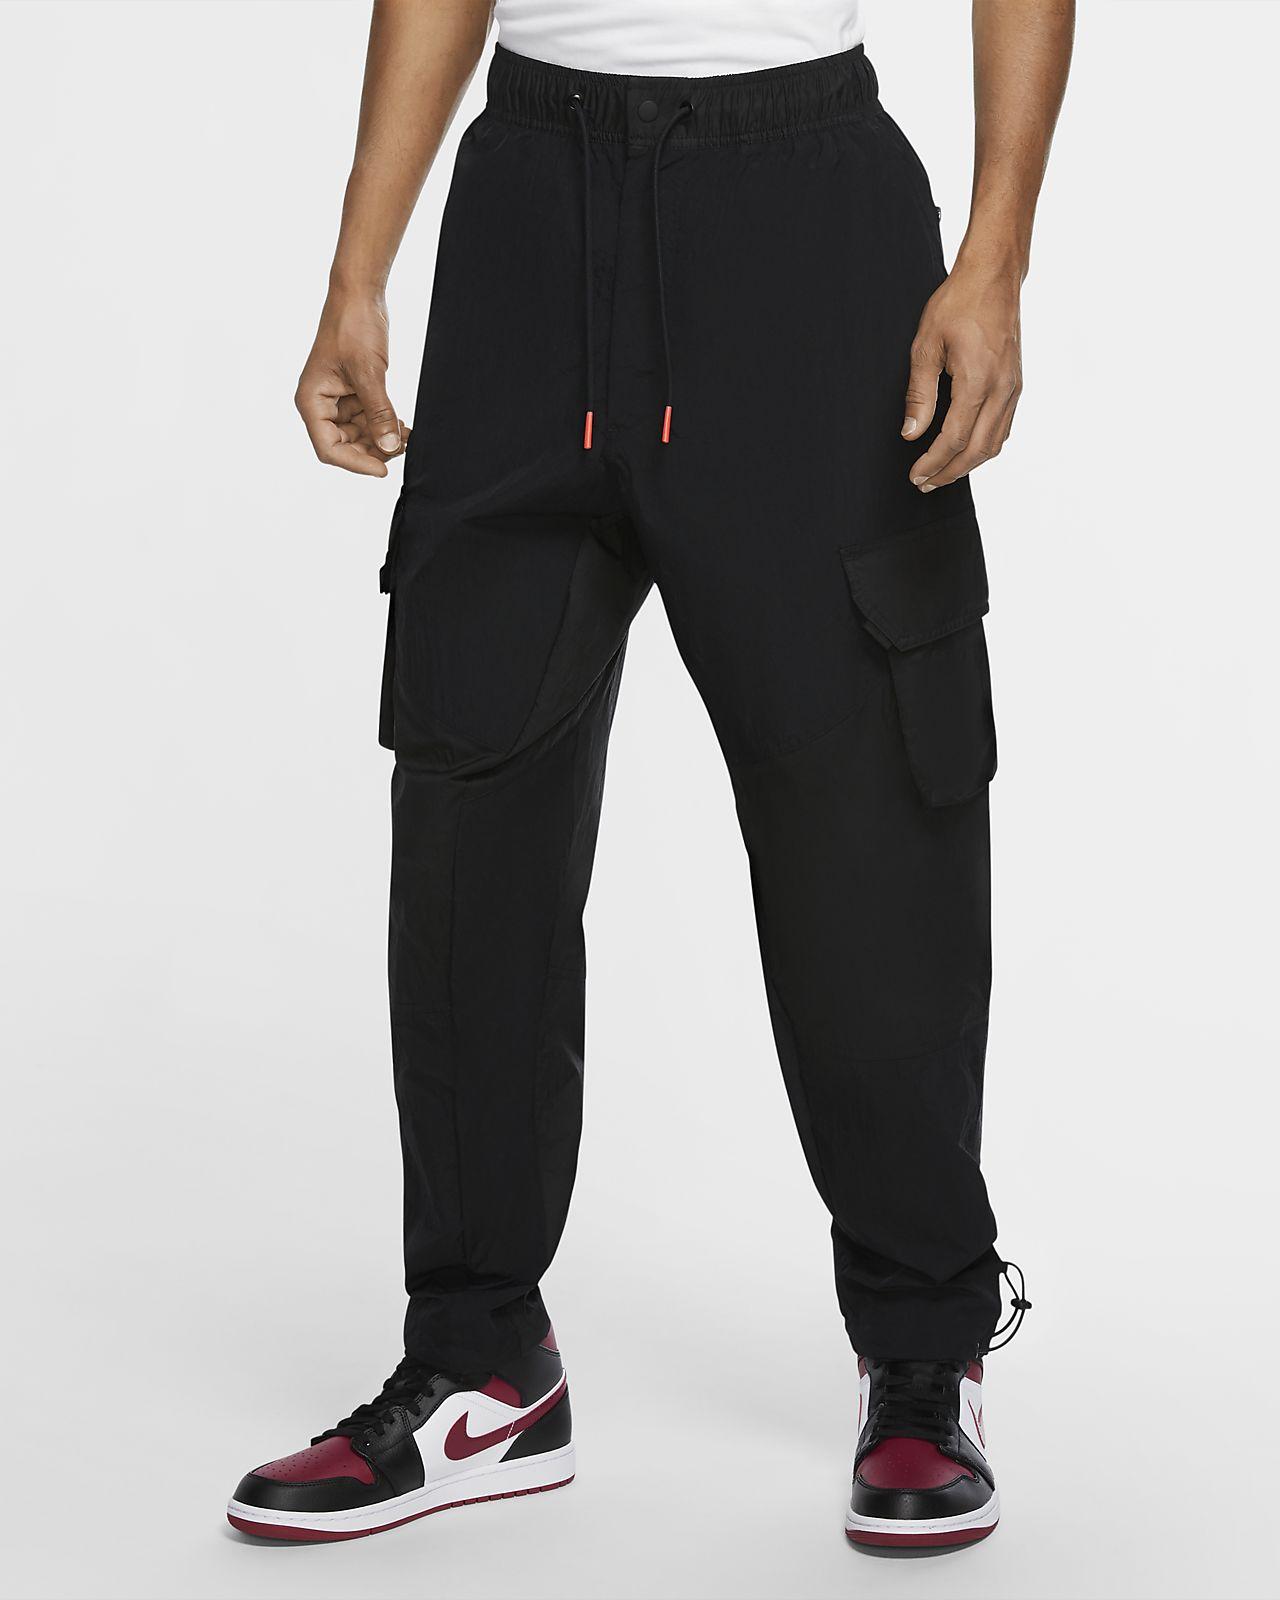 Jordan 23 Engineered Men's Cargo Trousers